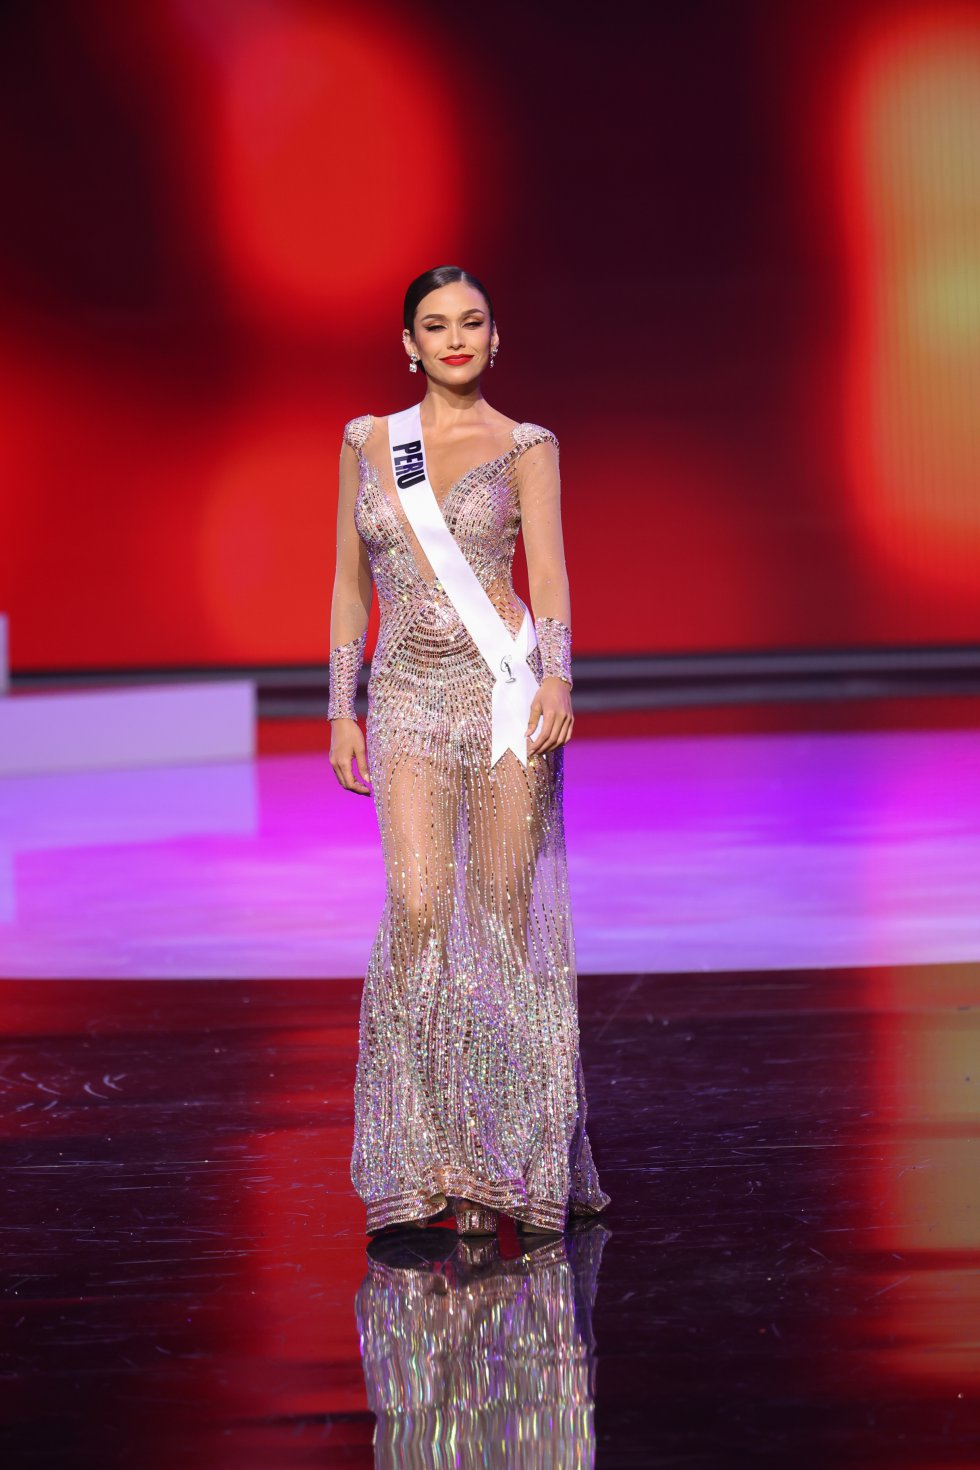 Finalistas certamen MissUniverse 2020